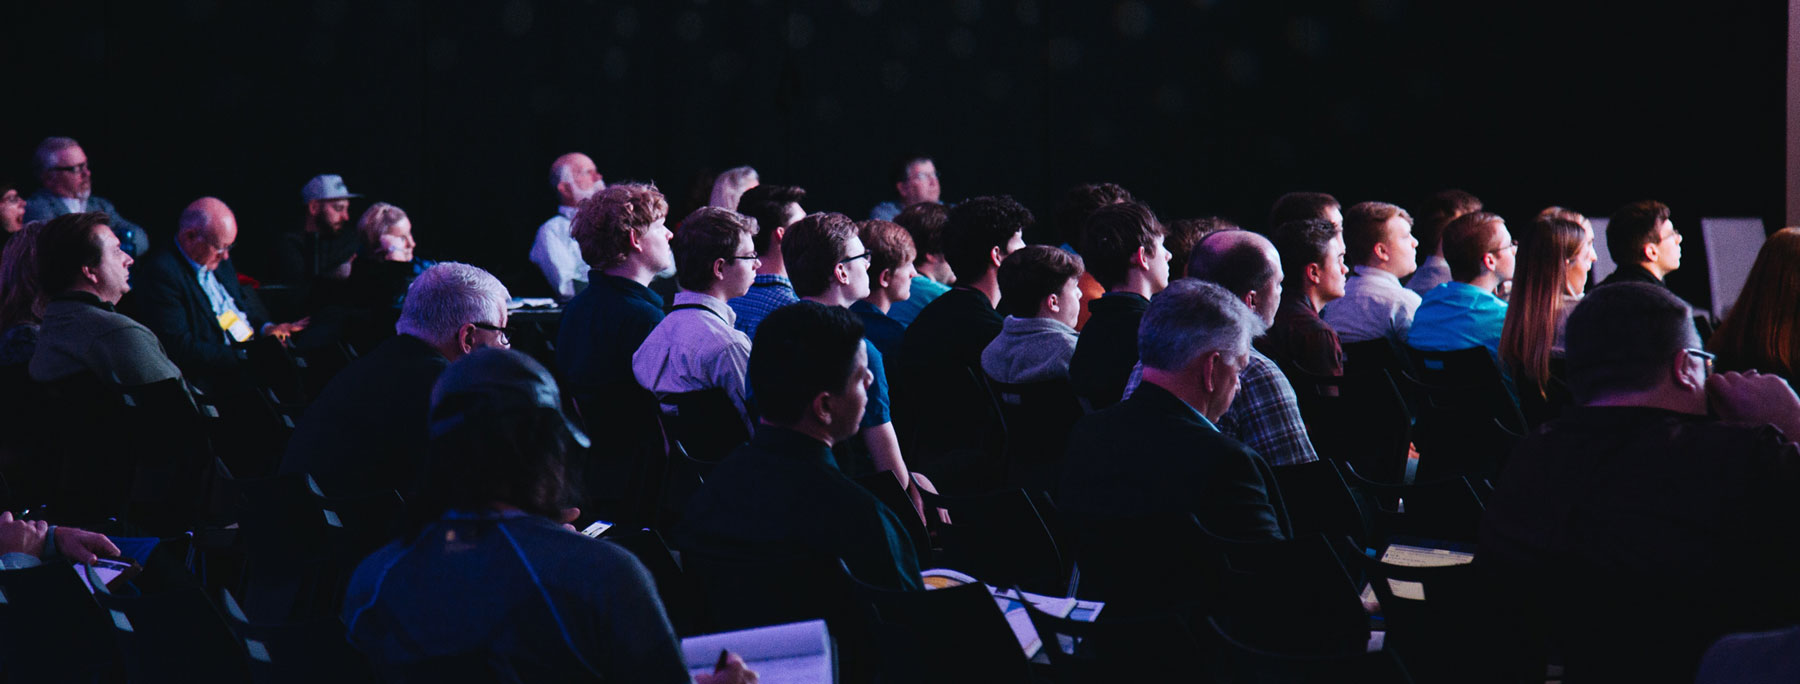 Think Tanks 2020 & NISTM Announcements